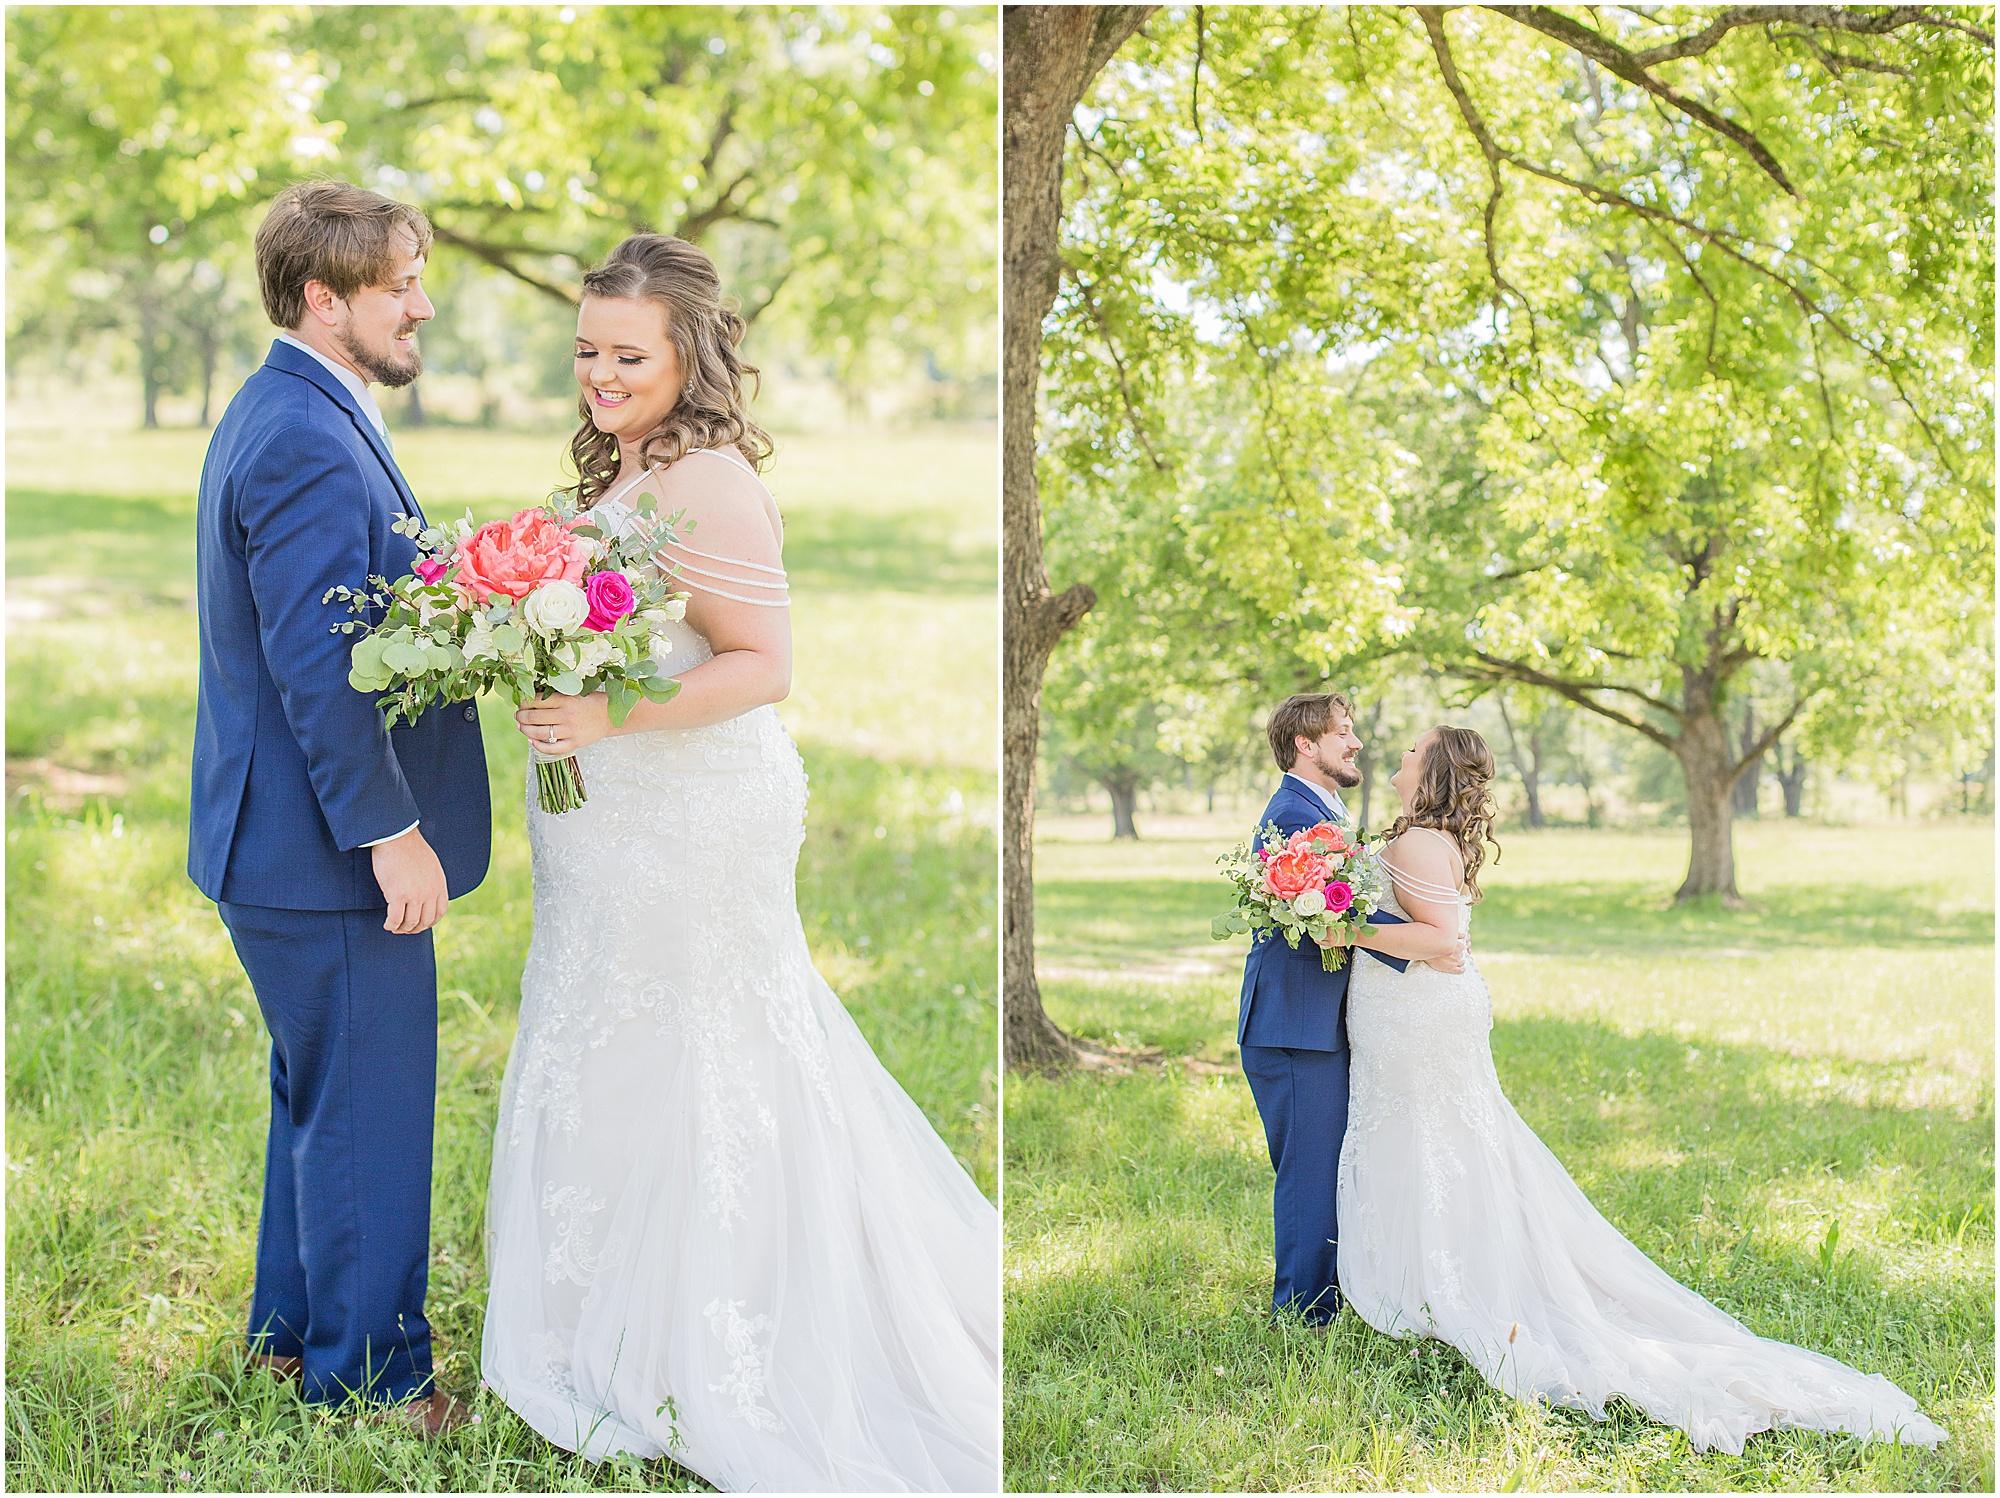 starkville-mississippi-wedding-page-place-dodson-farms_0025.jpg